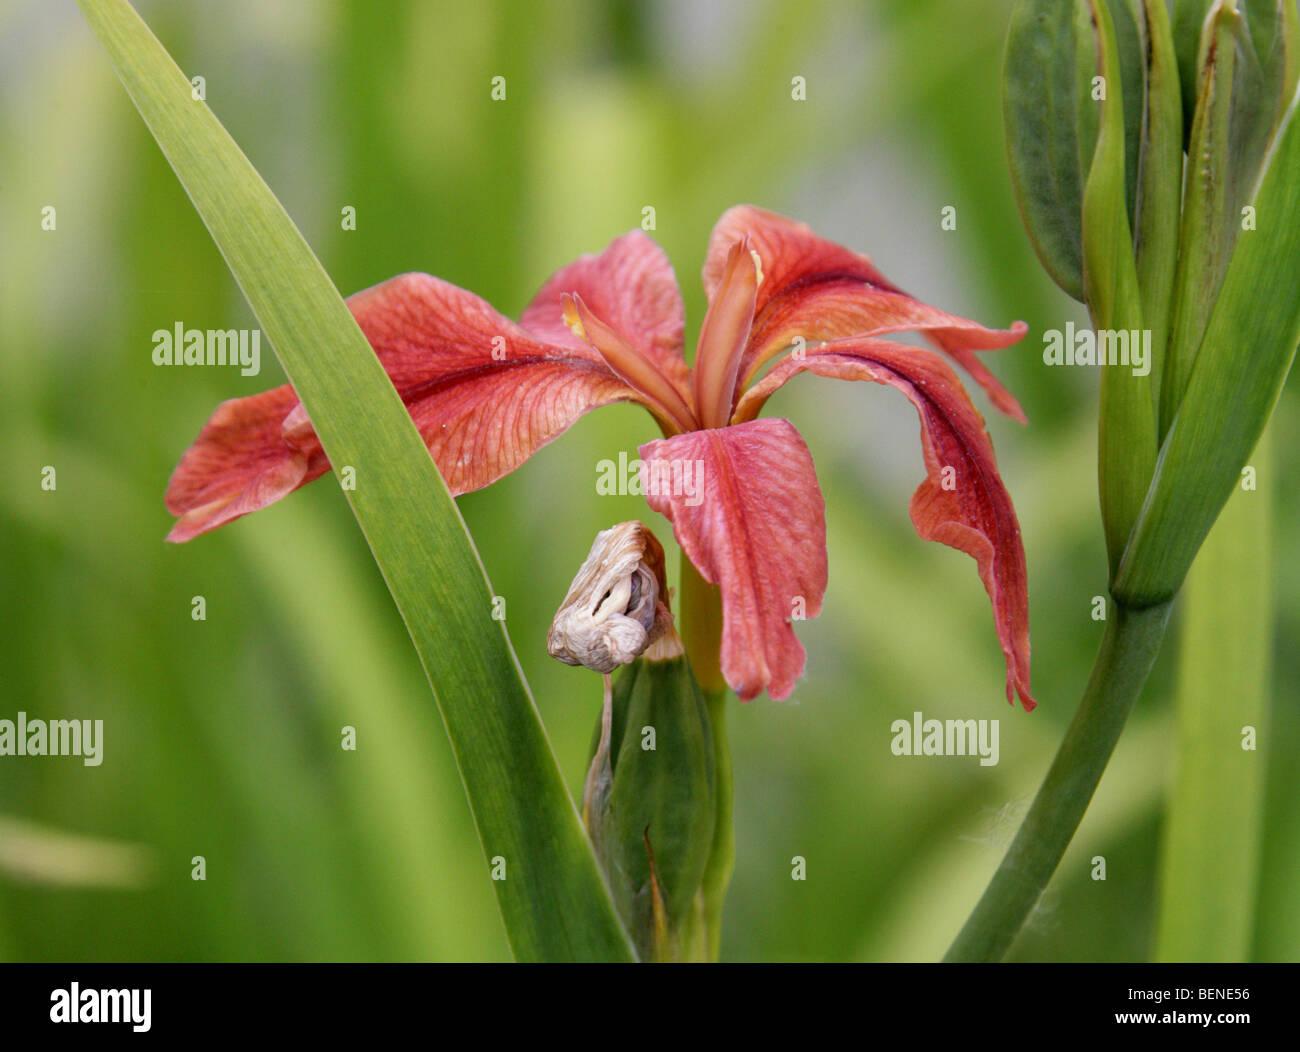 Red Iris Flower Iridaceae Stock Photos Red Iris Flower Iridaceae